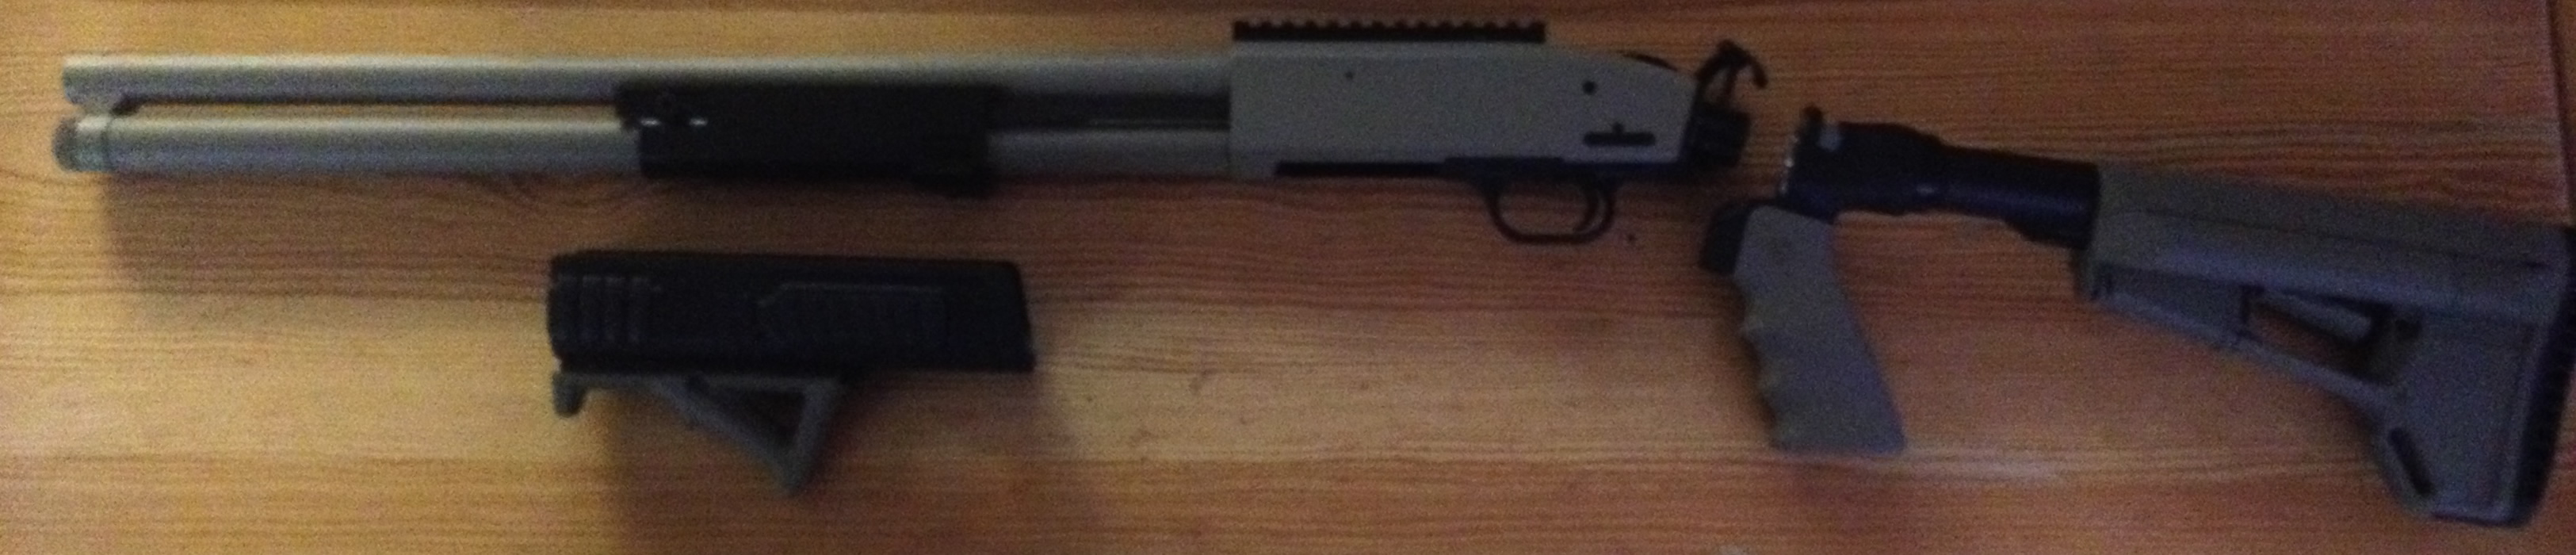 shotgun4